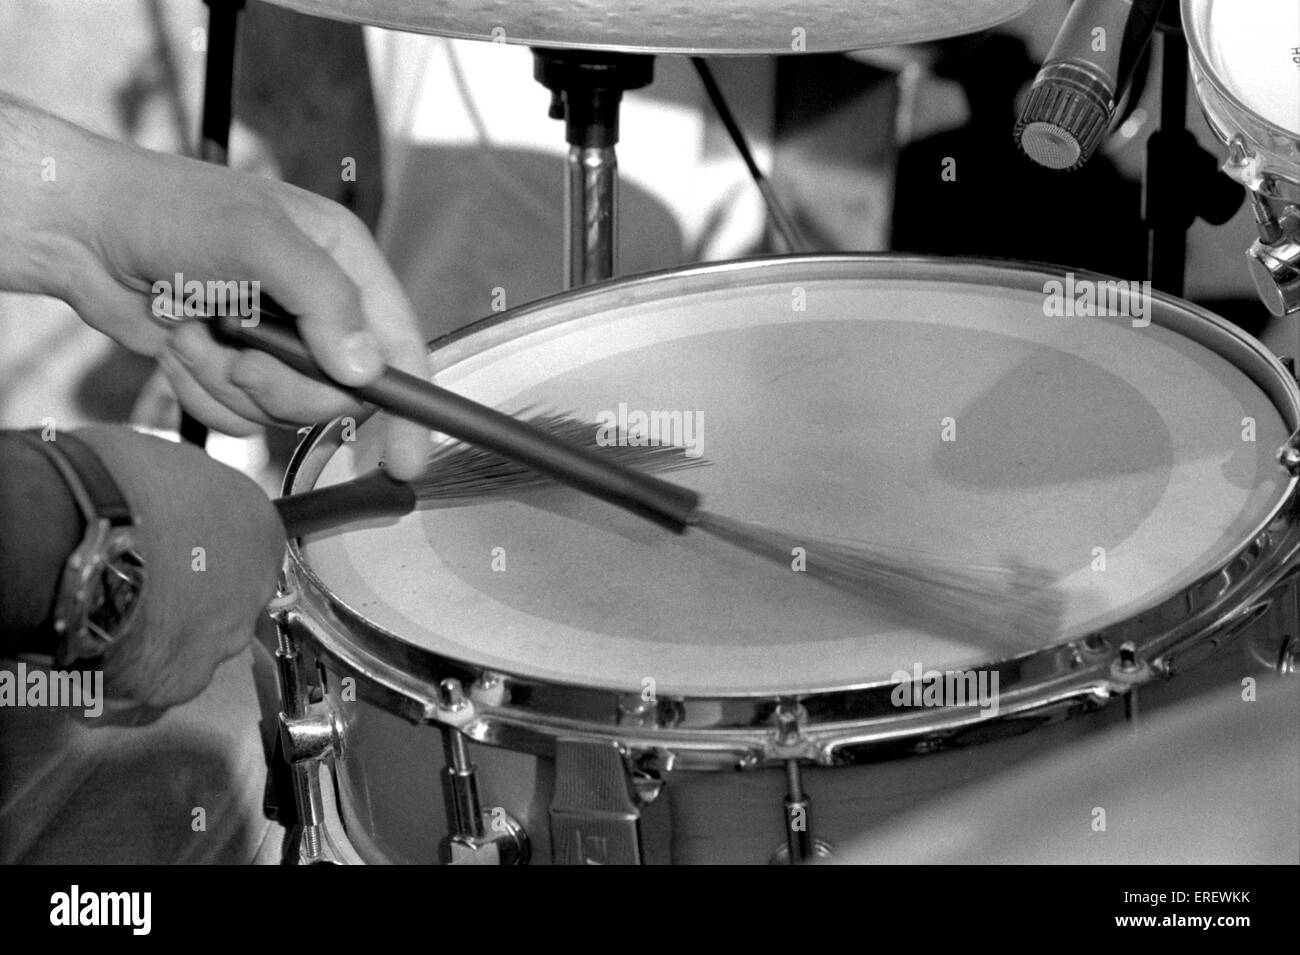 A Snare Drum Stockfotos & A Snare Drum Bilder - Alamy